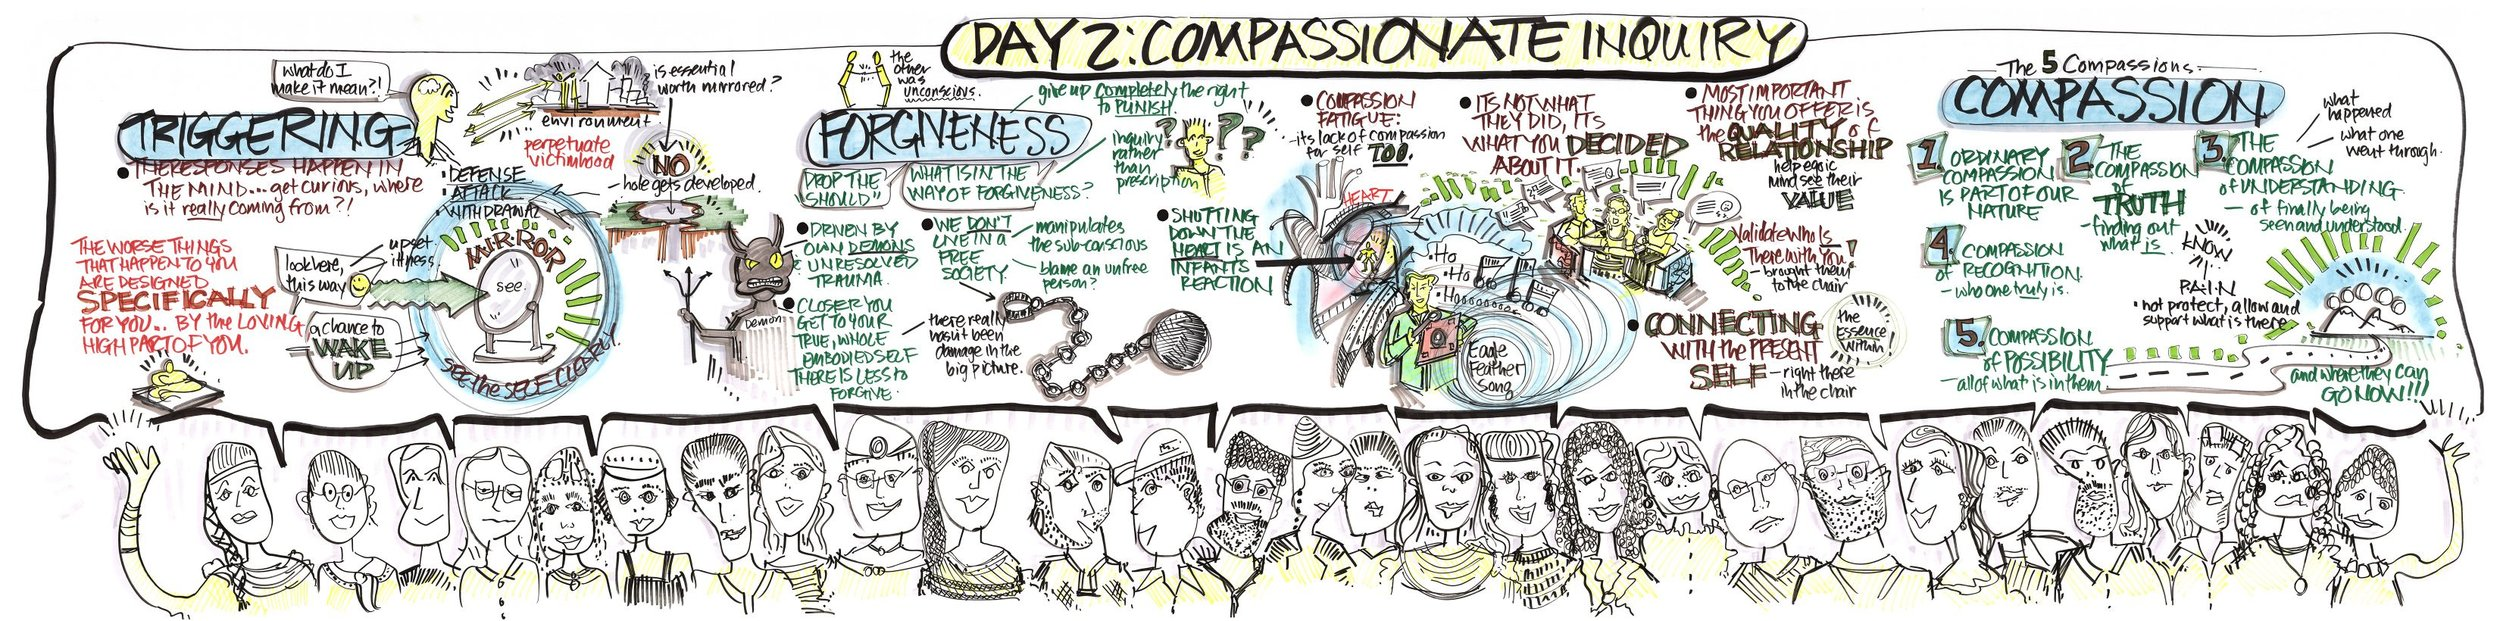 GABOR MATÉ COMPASSIONATE INQUIRY WORKSHOP: DAY 2 - COMPASSIONATE INQUIRY [   CLICK TO ENLARGE   ]